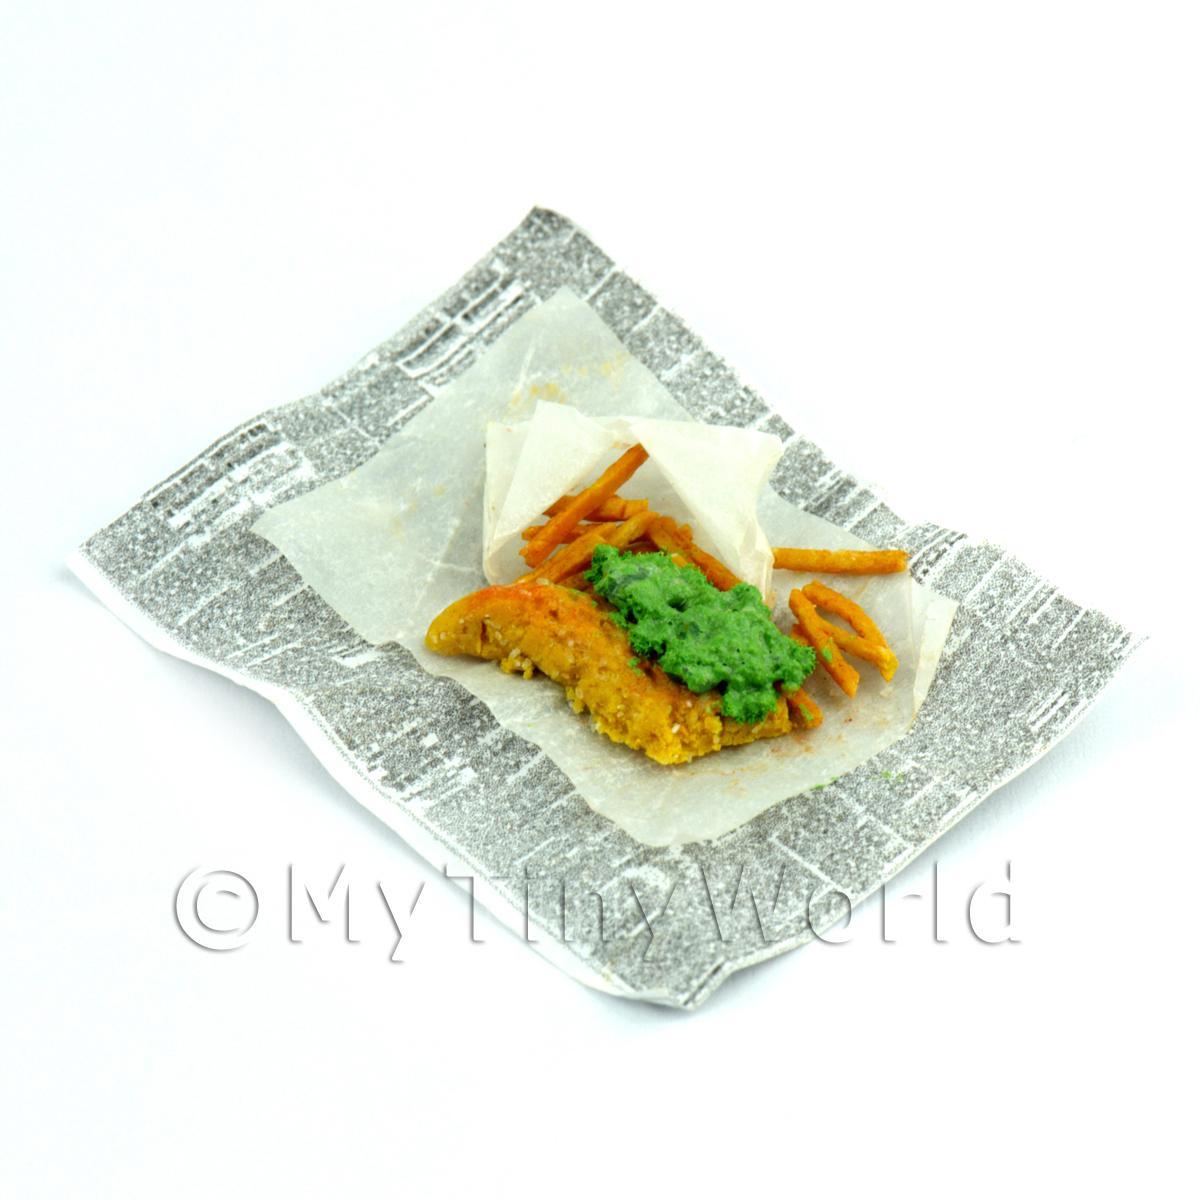 Tiny Kitchen Fish And Chips: Dolls House Miniature Chip Shop - Dolls House Miniature Fish, Chips And Mushy Peas